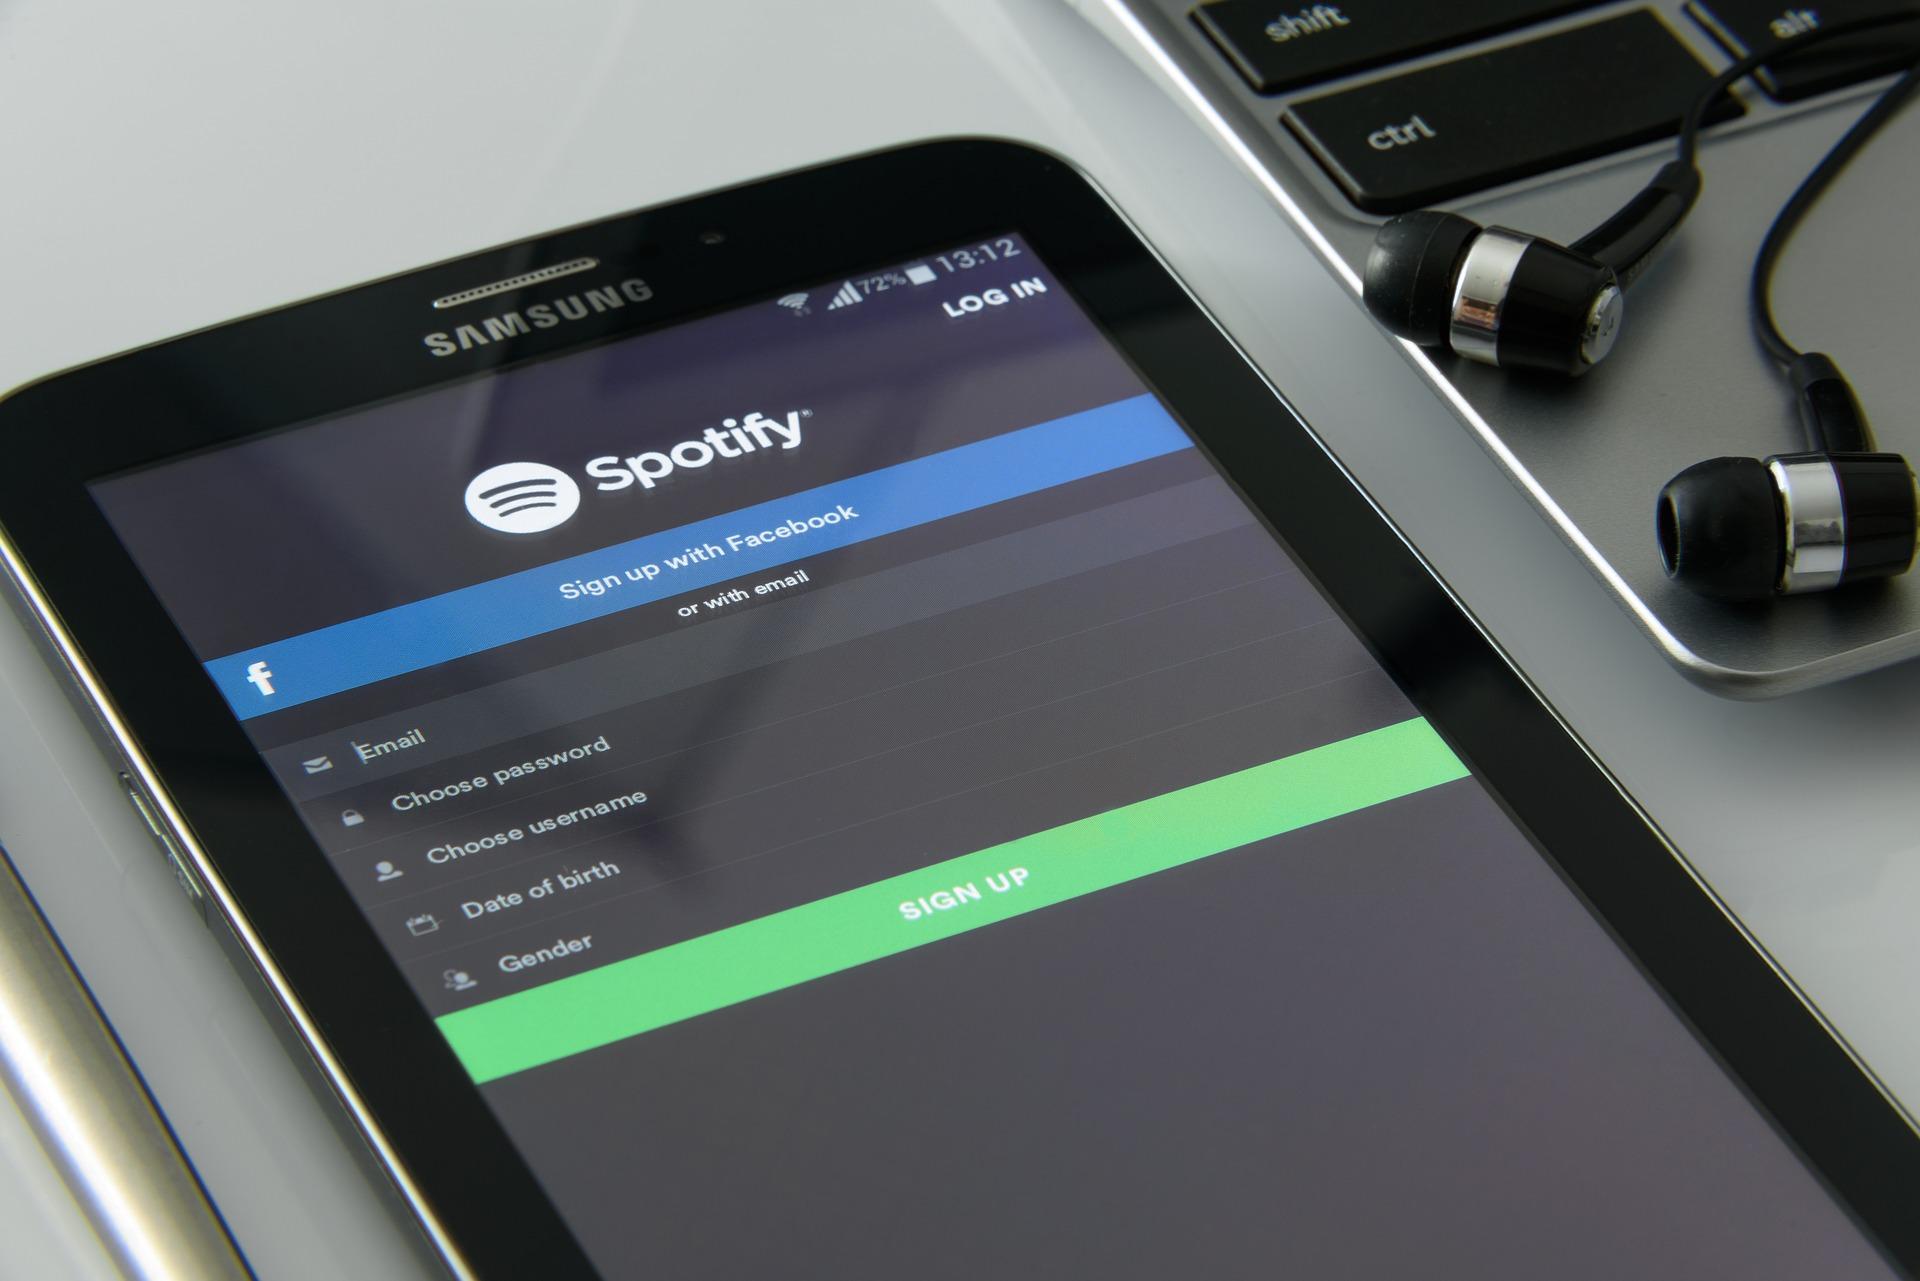 Reddit Spotify Streams